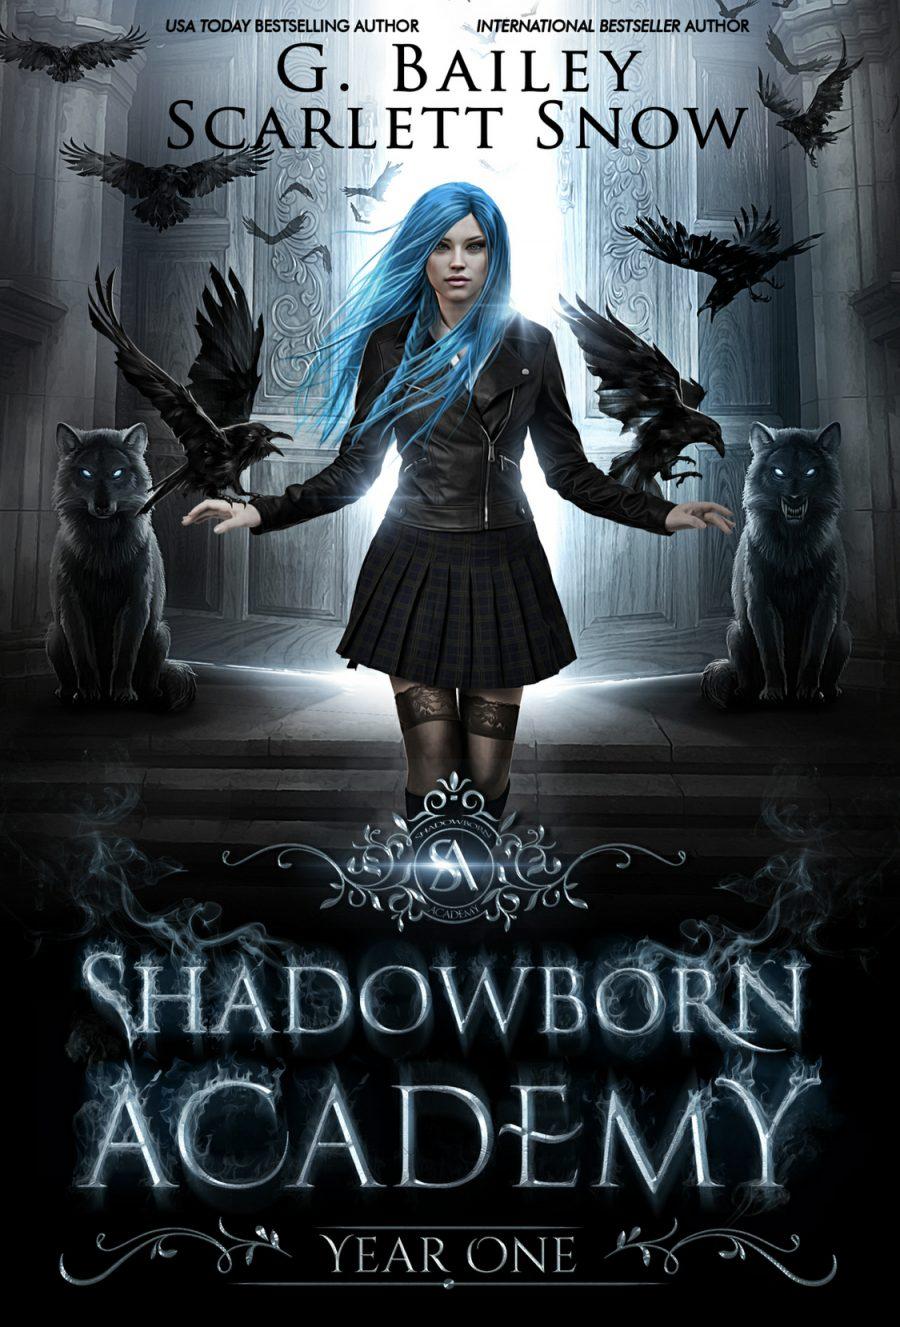 Shadowborn Academy: Year One by G. Bailey & Scarlett Snow - A Book Review #BookReview #4Stars #SlowBurn #RH #Academy #Dark #Fantasy #KindleUnlimited #KU